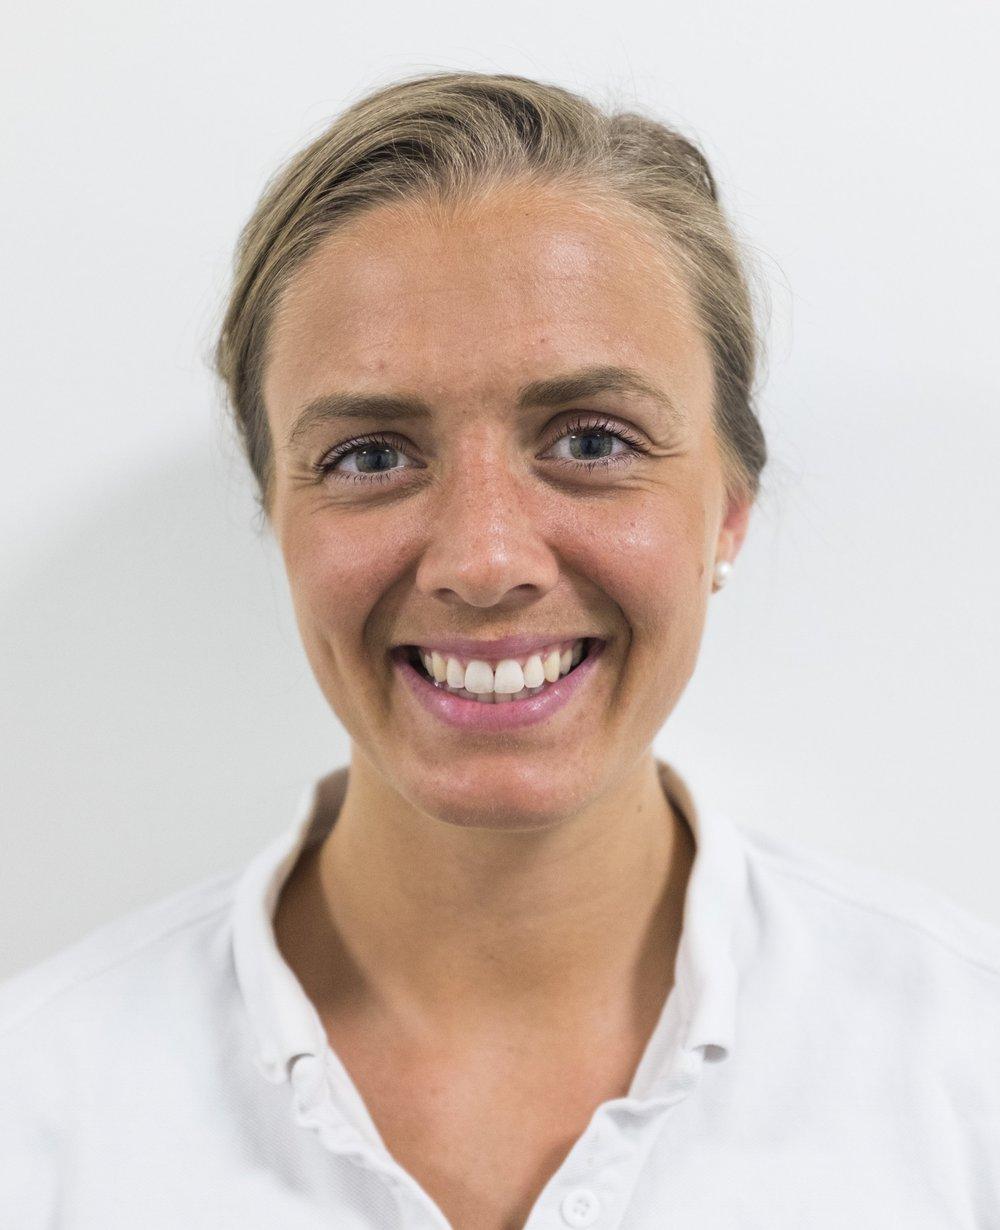 Annecken Lister Haugen vil tiltre som ny kiropraktor på Fokusklinikken Vinderen fra 1. august.